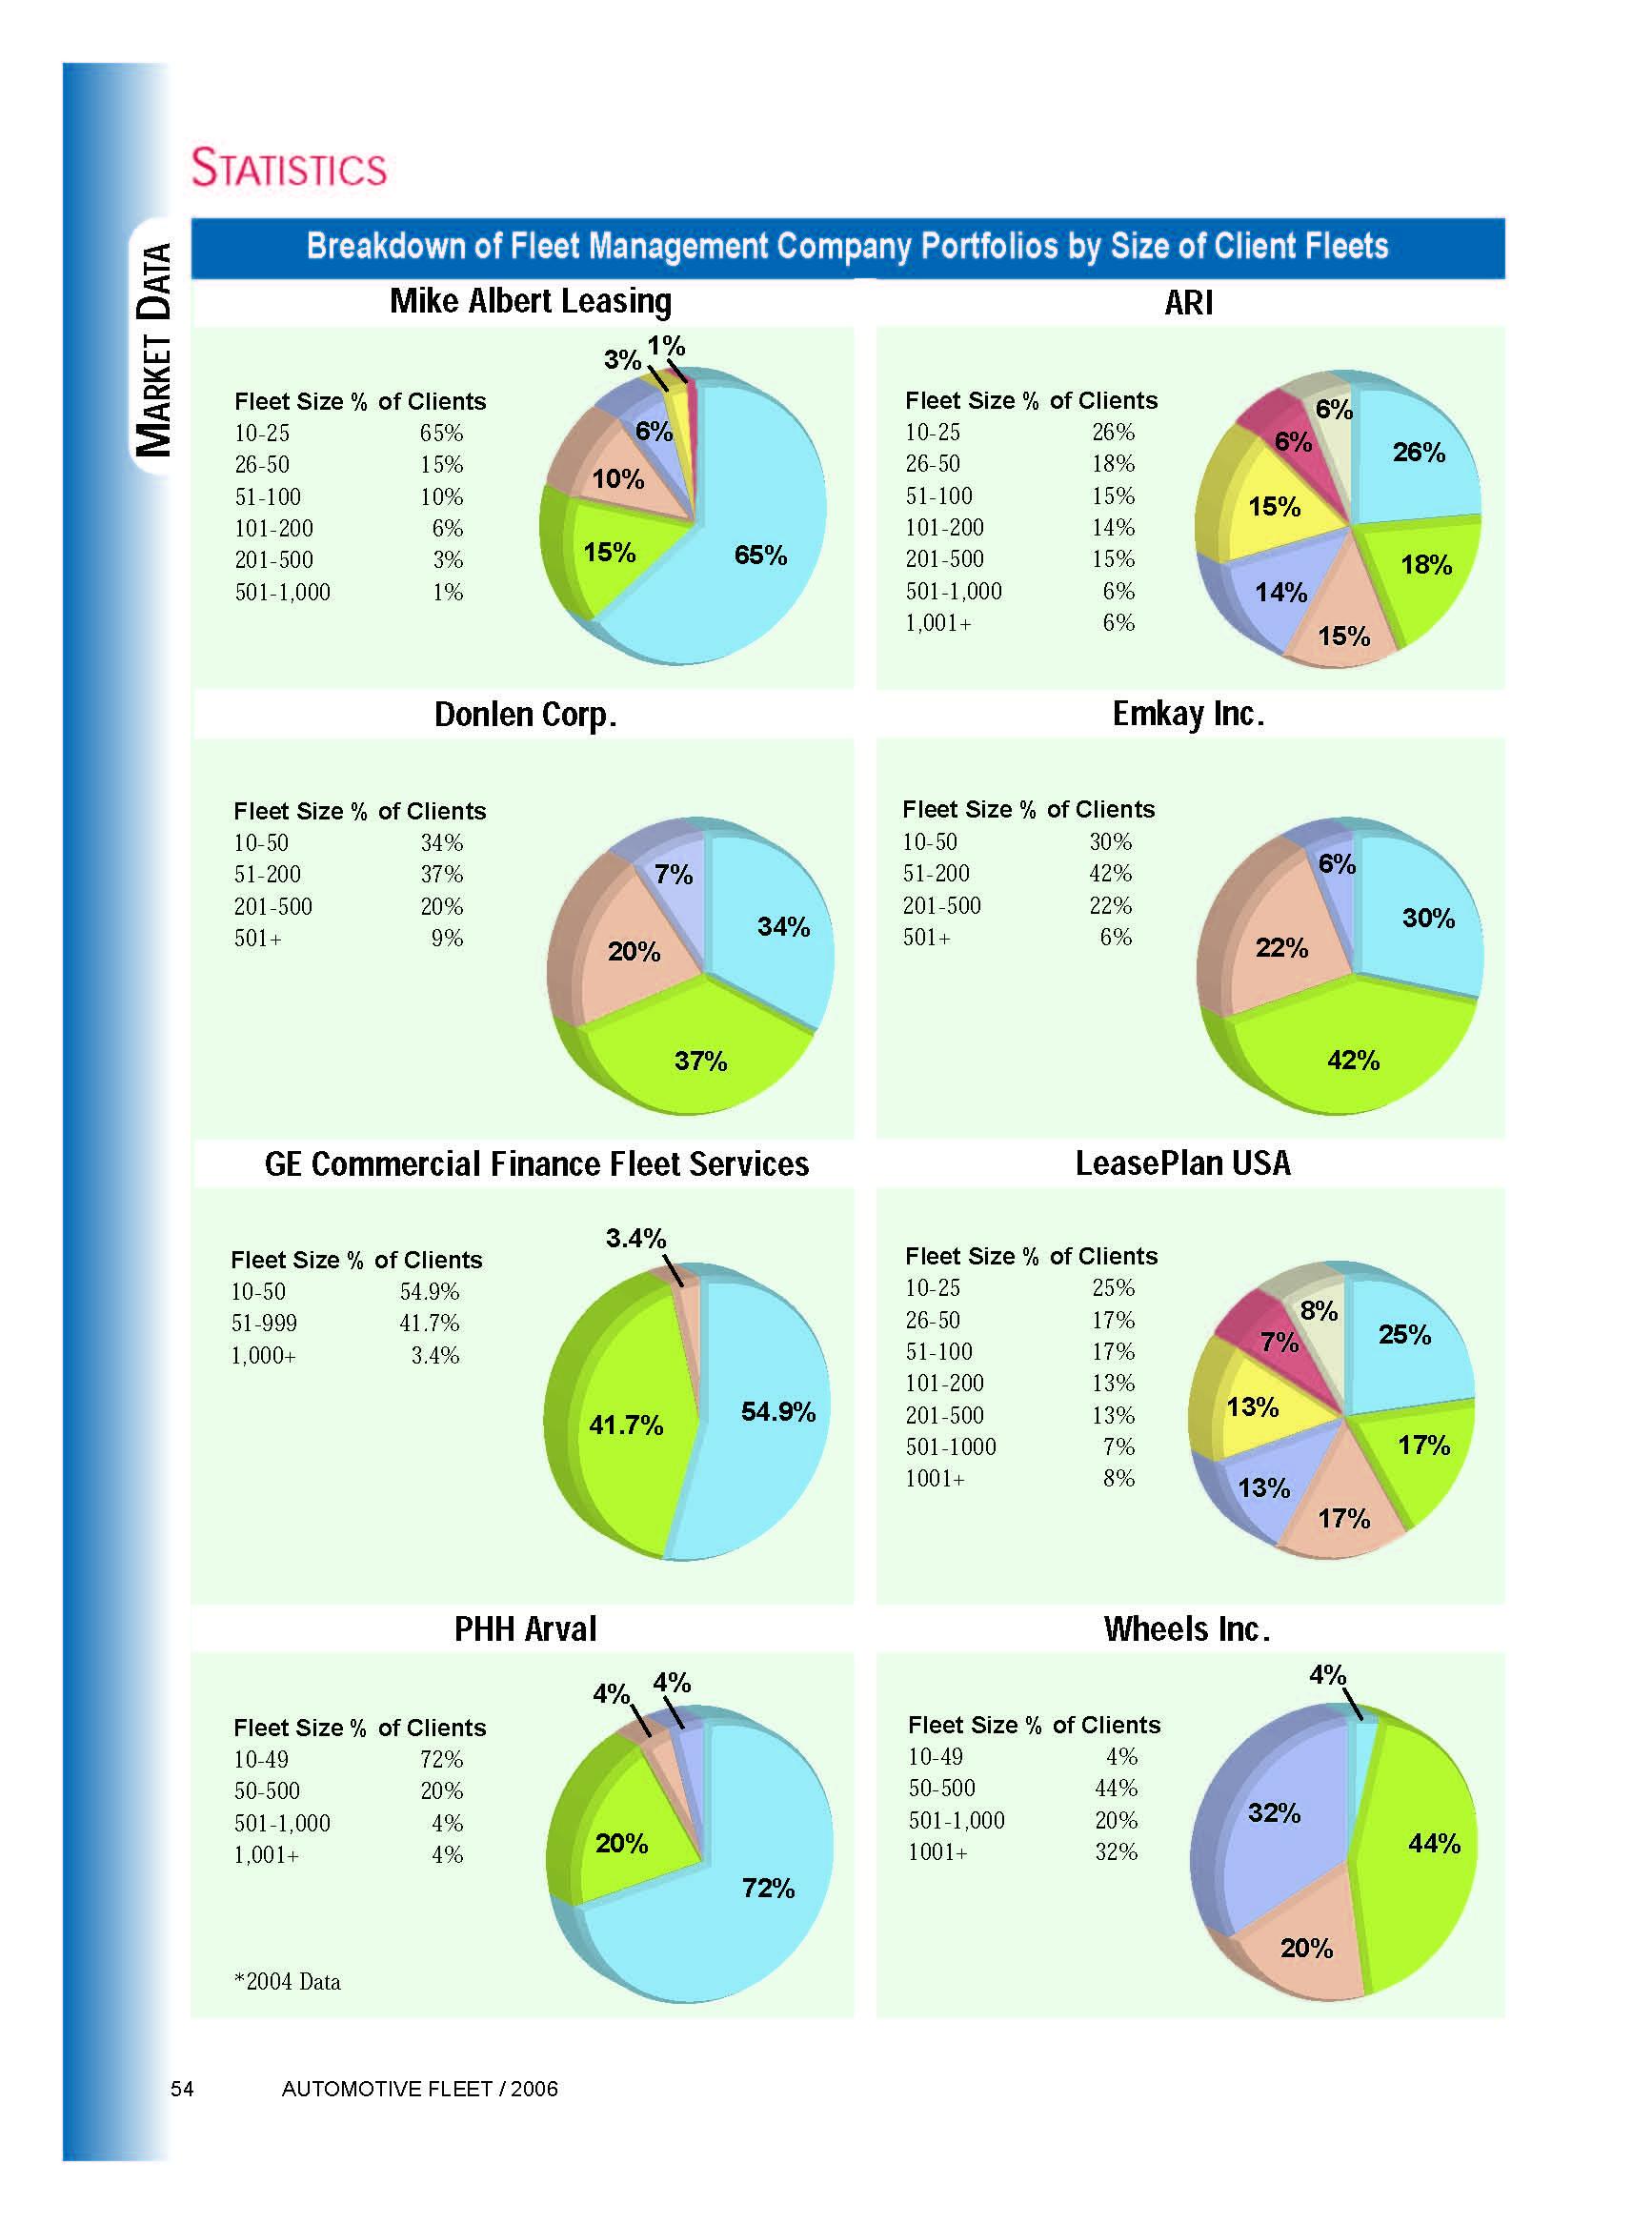 2005 Fleet Size in Lessor Portfolios